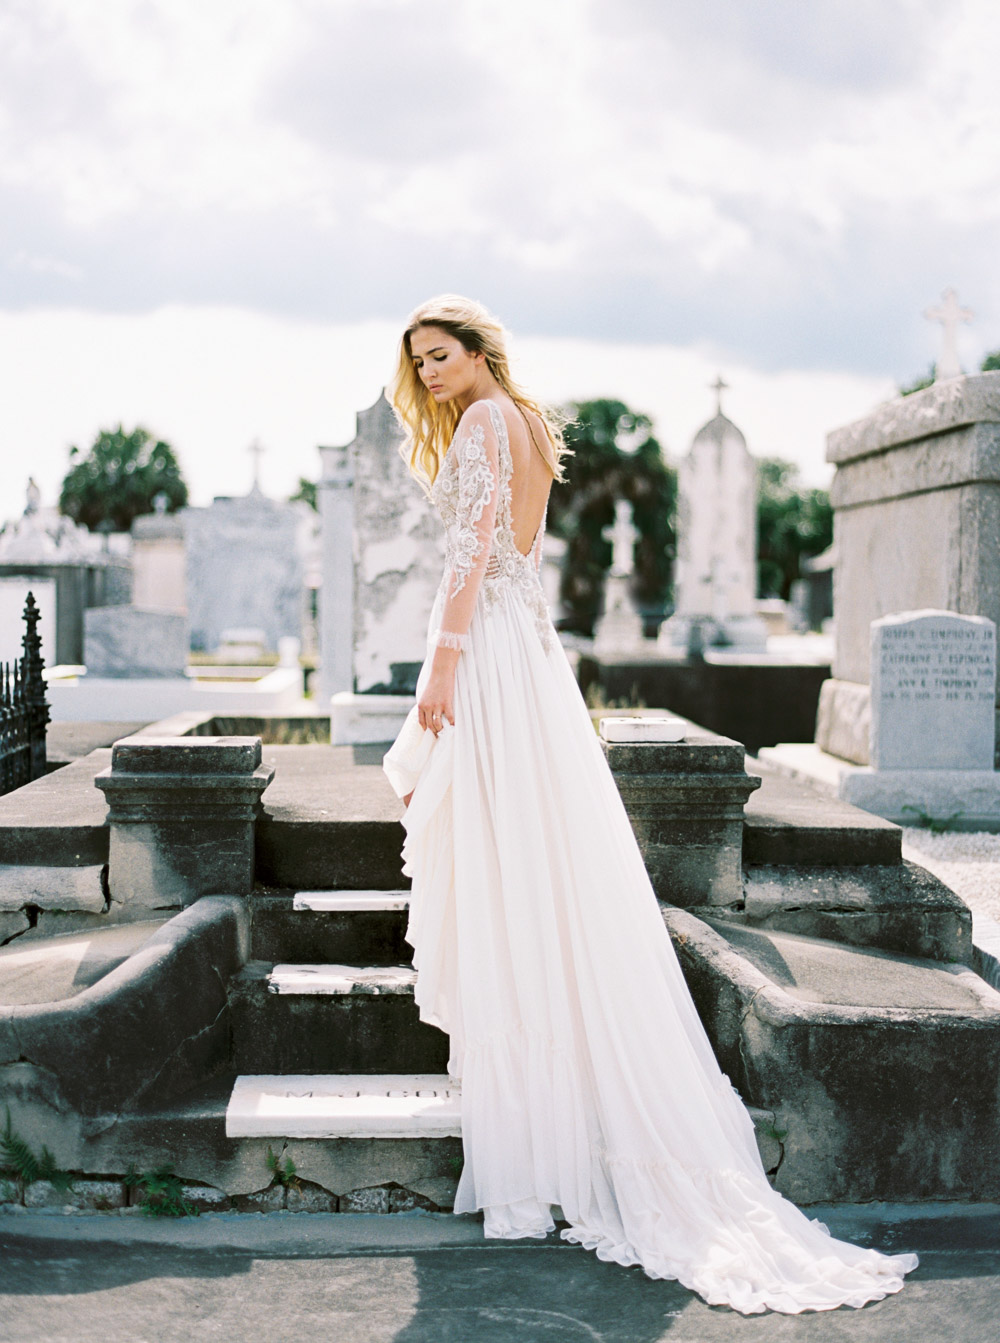 Katie Grant Photography (45 of 45).jpg